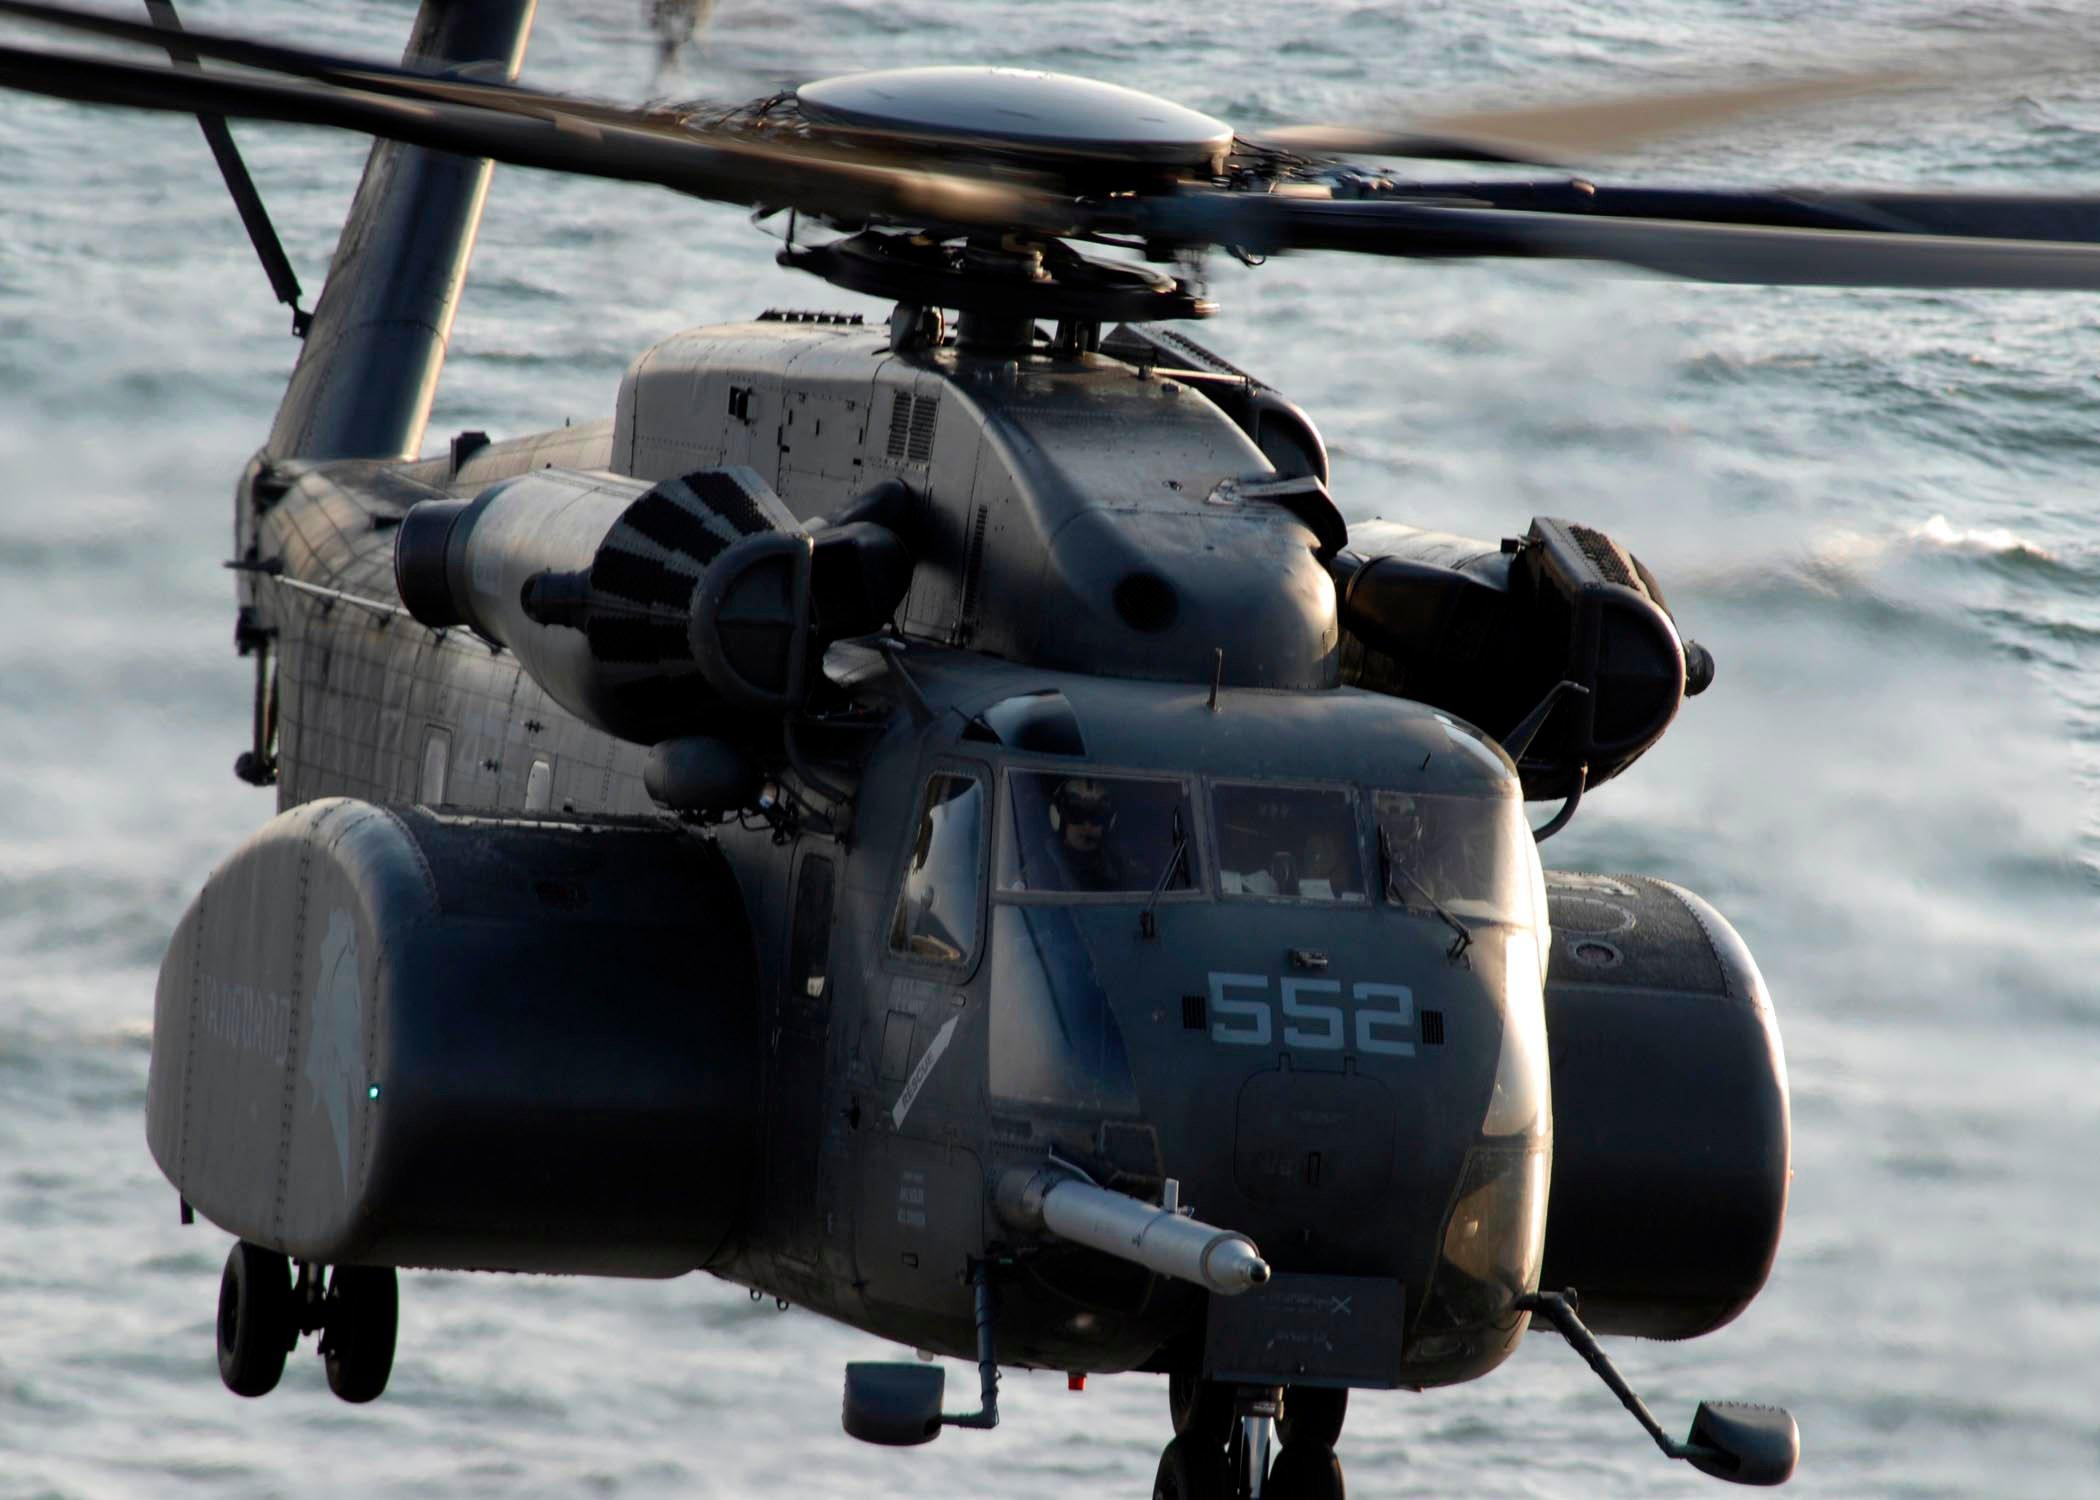 "MH-53E from Mine Countermeasure Squadron 14 ""Vanguard"" (HM-14) in 2006. US Navy Photo"